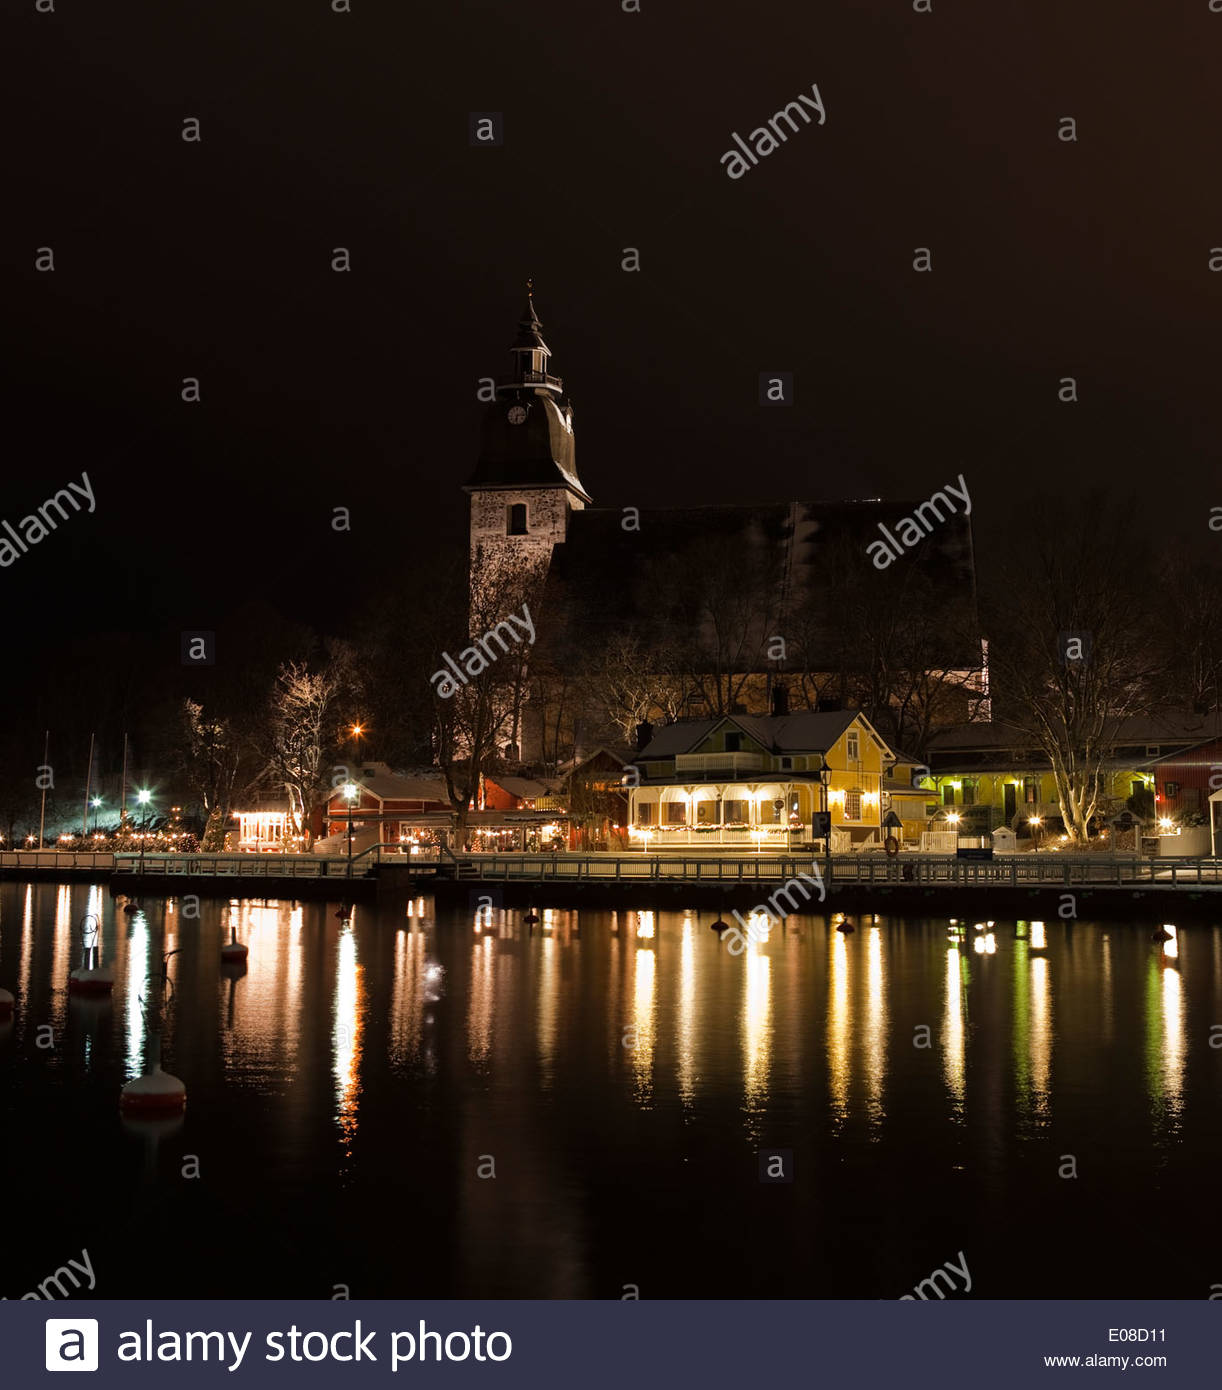 Beautiful view in Naantali Finland - Stock Image